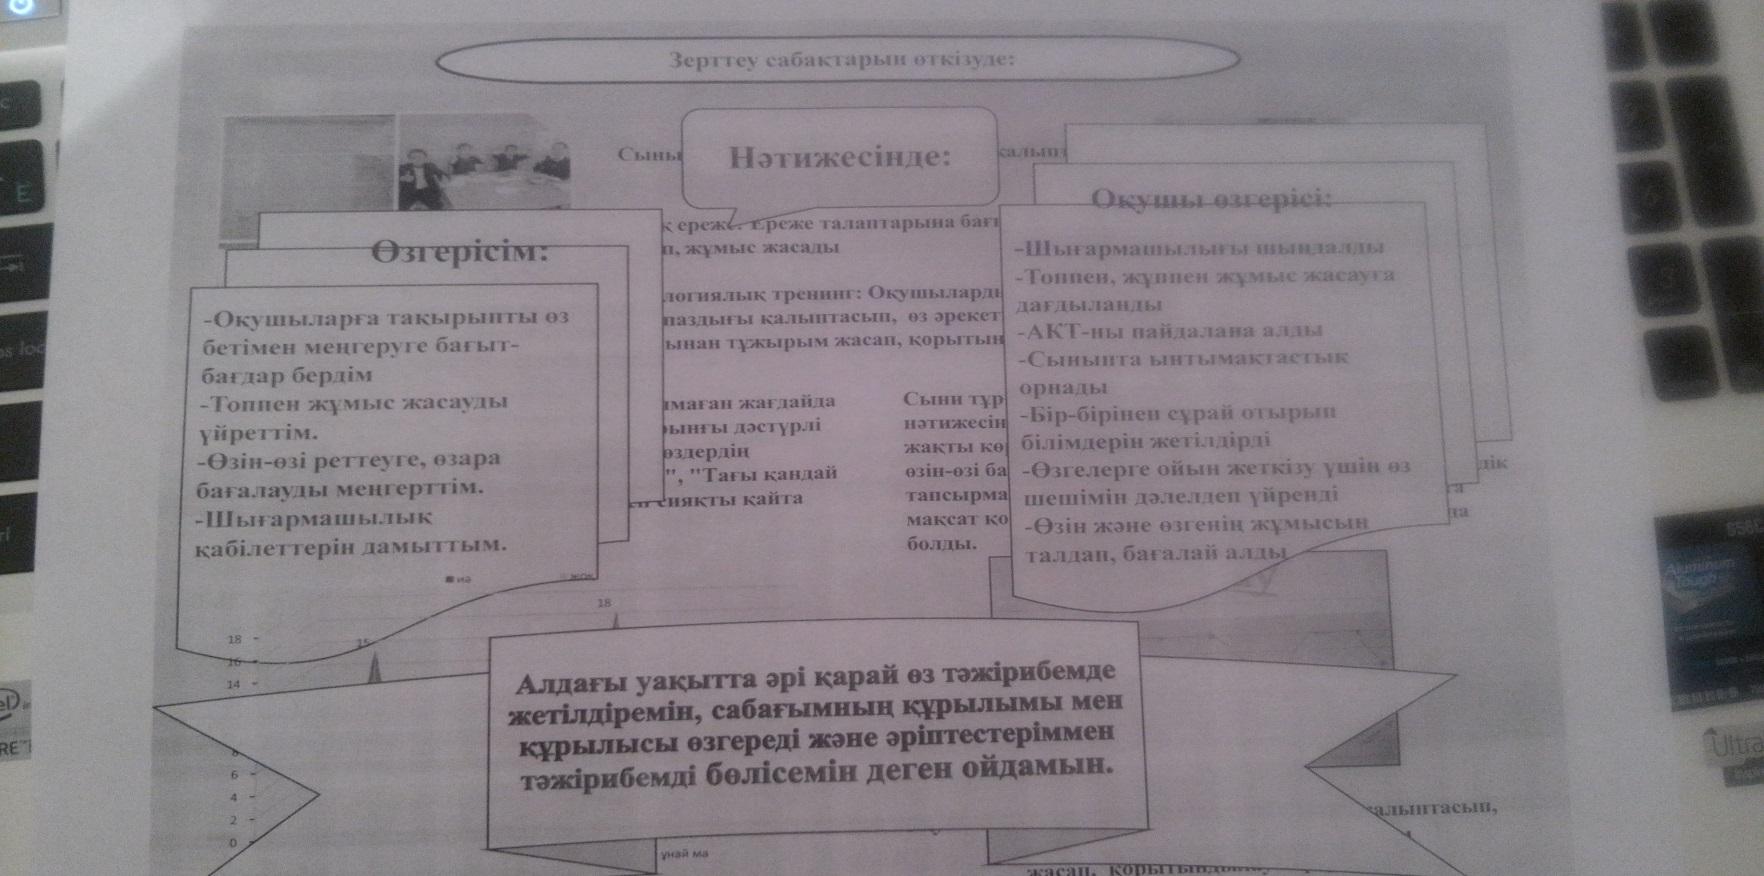 C:\Users\ASUS\Documents\Bluetooth Folder\CAM00362.jpg